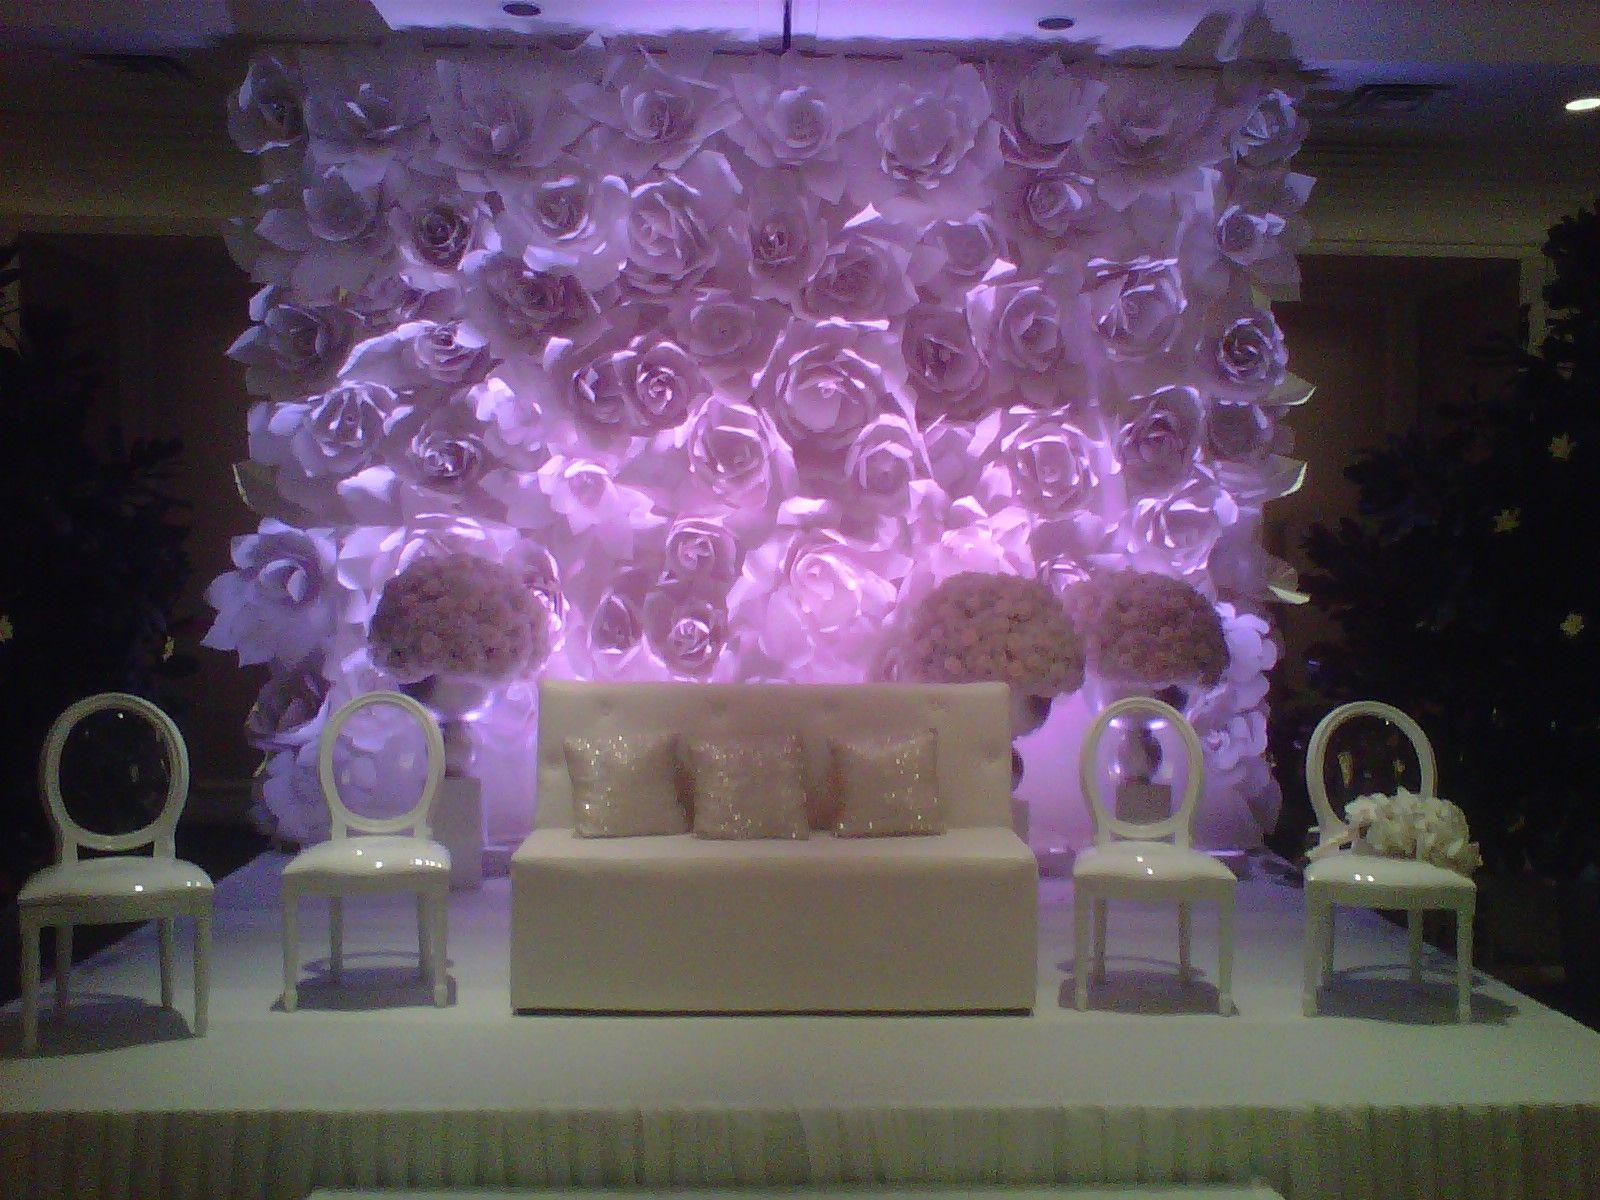 Paper flowers handmade tutorials diy chanel fashion show paper flowers handmade tutorials diy chanel fashion show inspired huge large paper flower wall dhlflorist Images